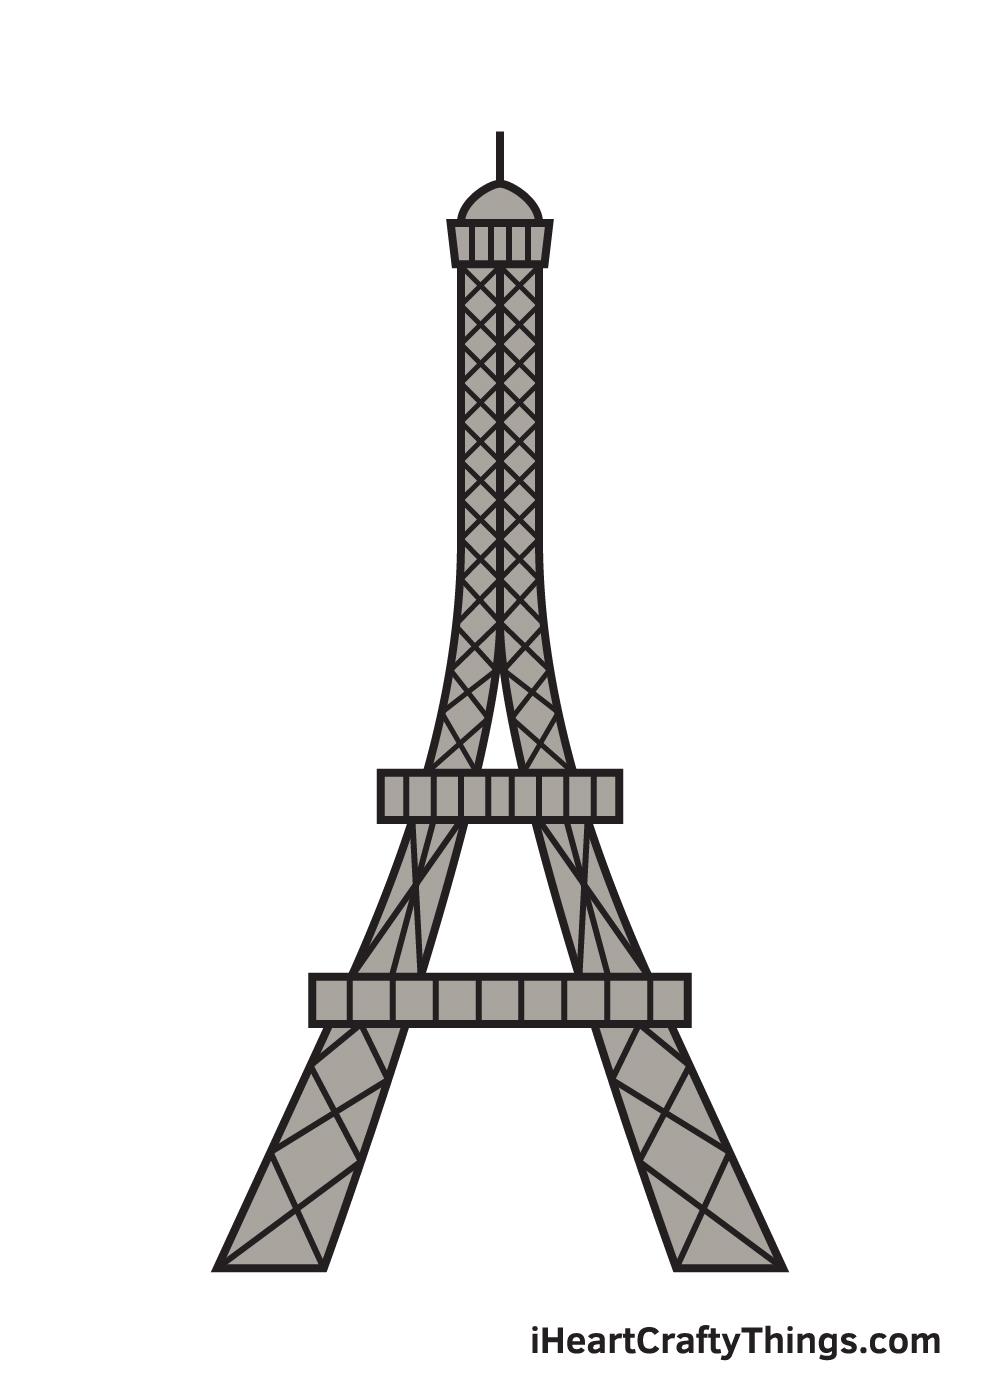 Eiffel Tower drawing - 9 steps